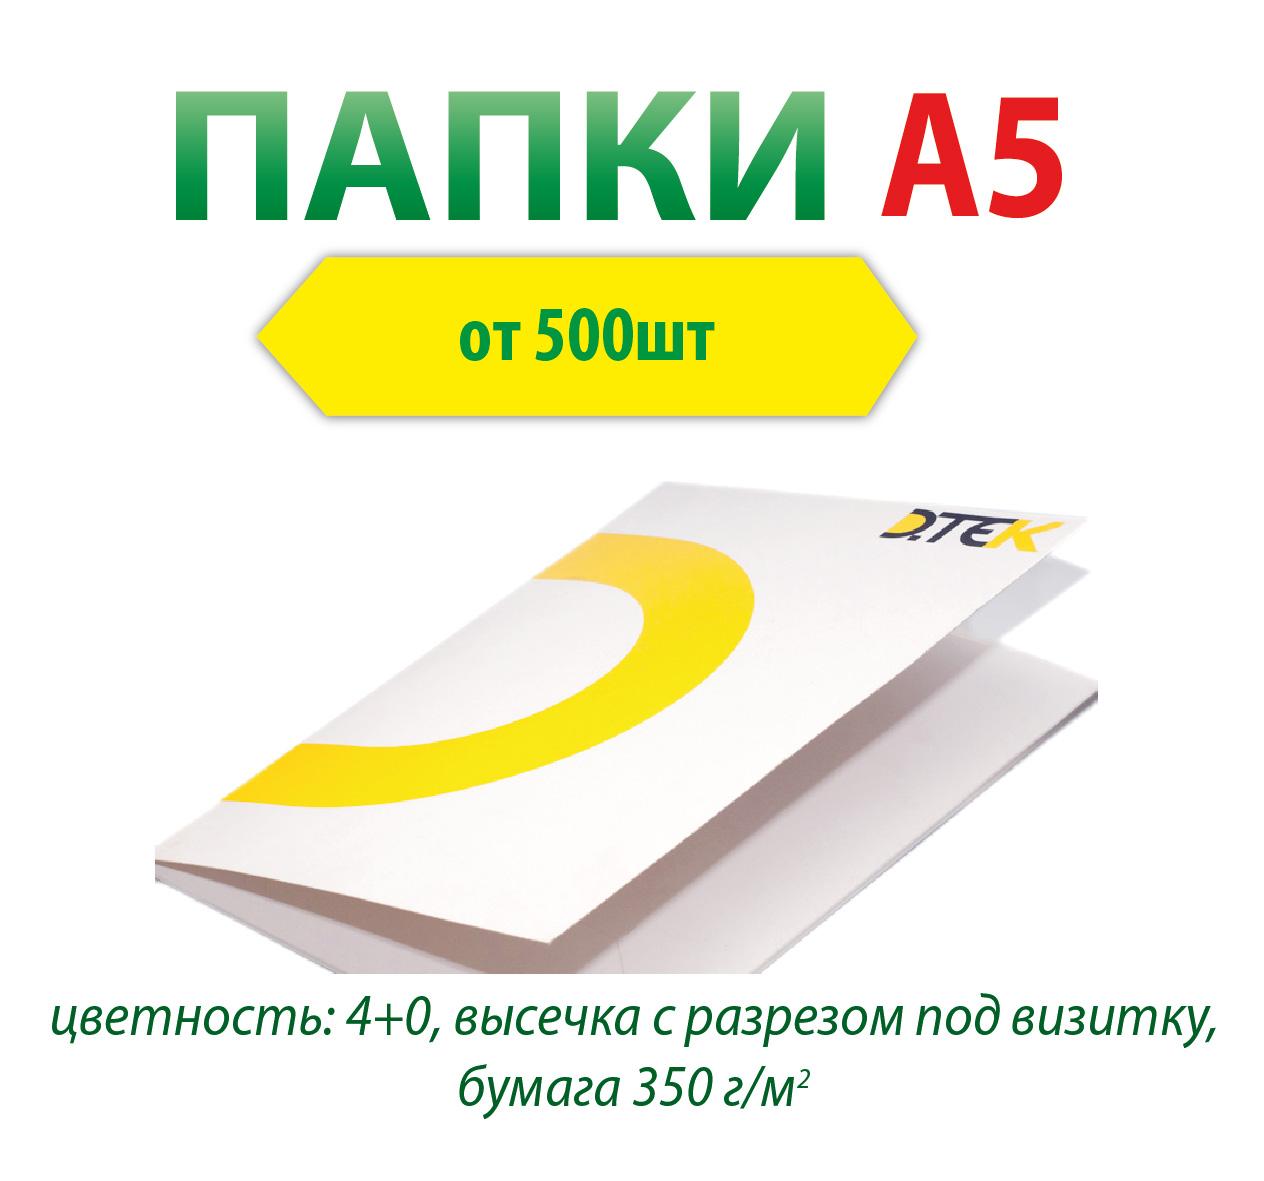 8-01_138996275442